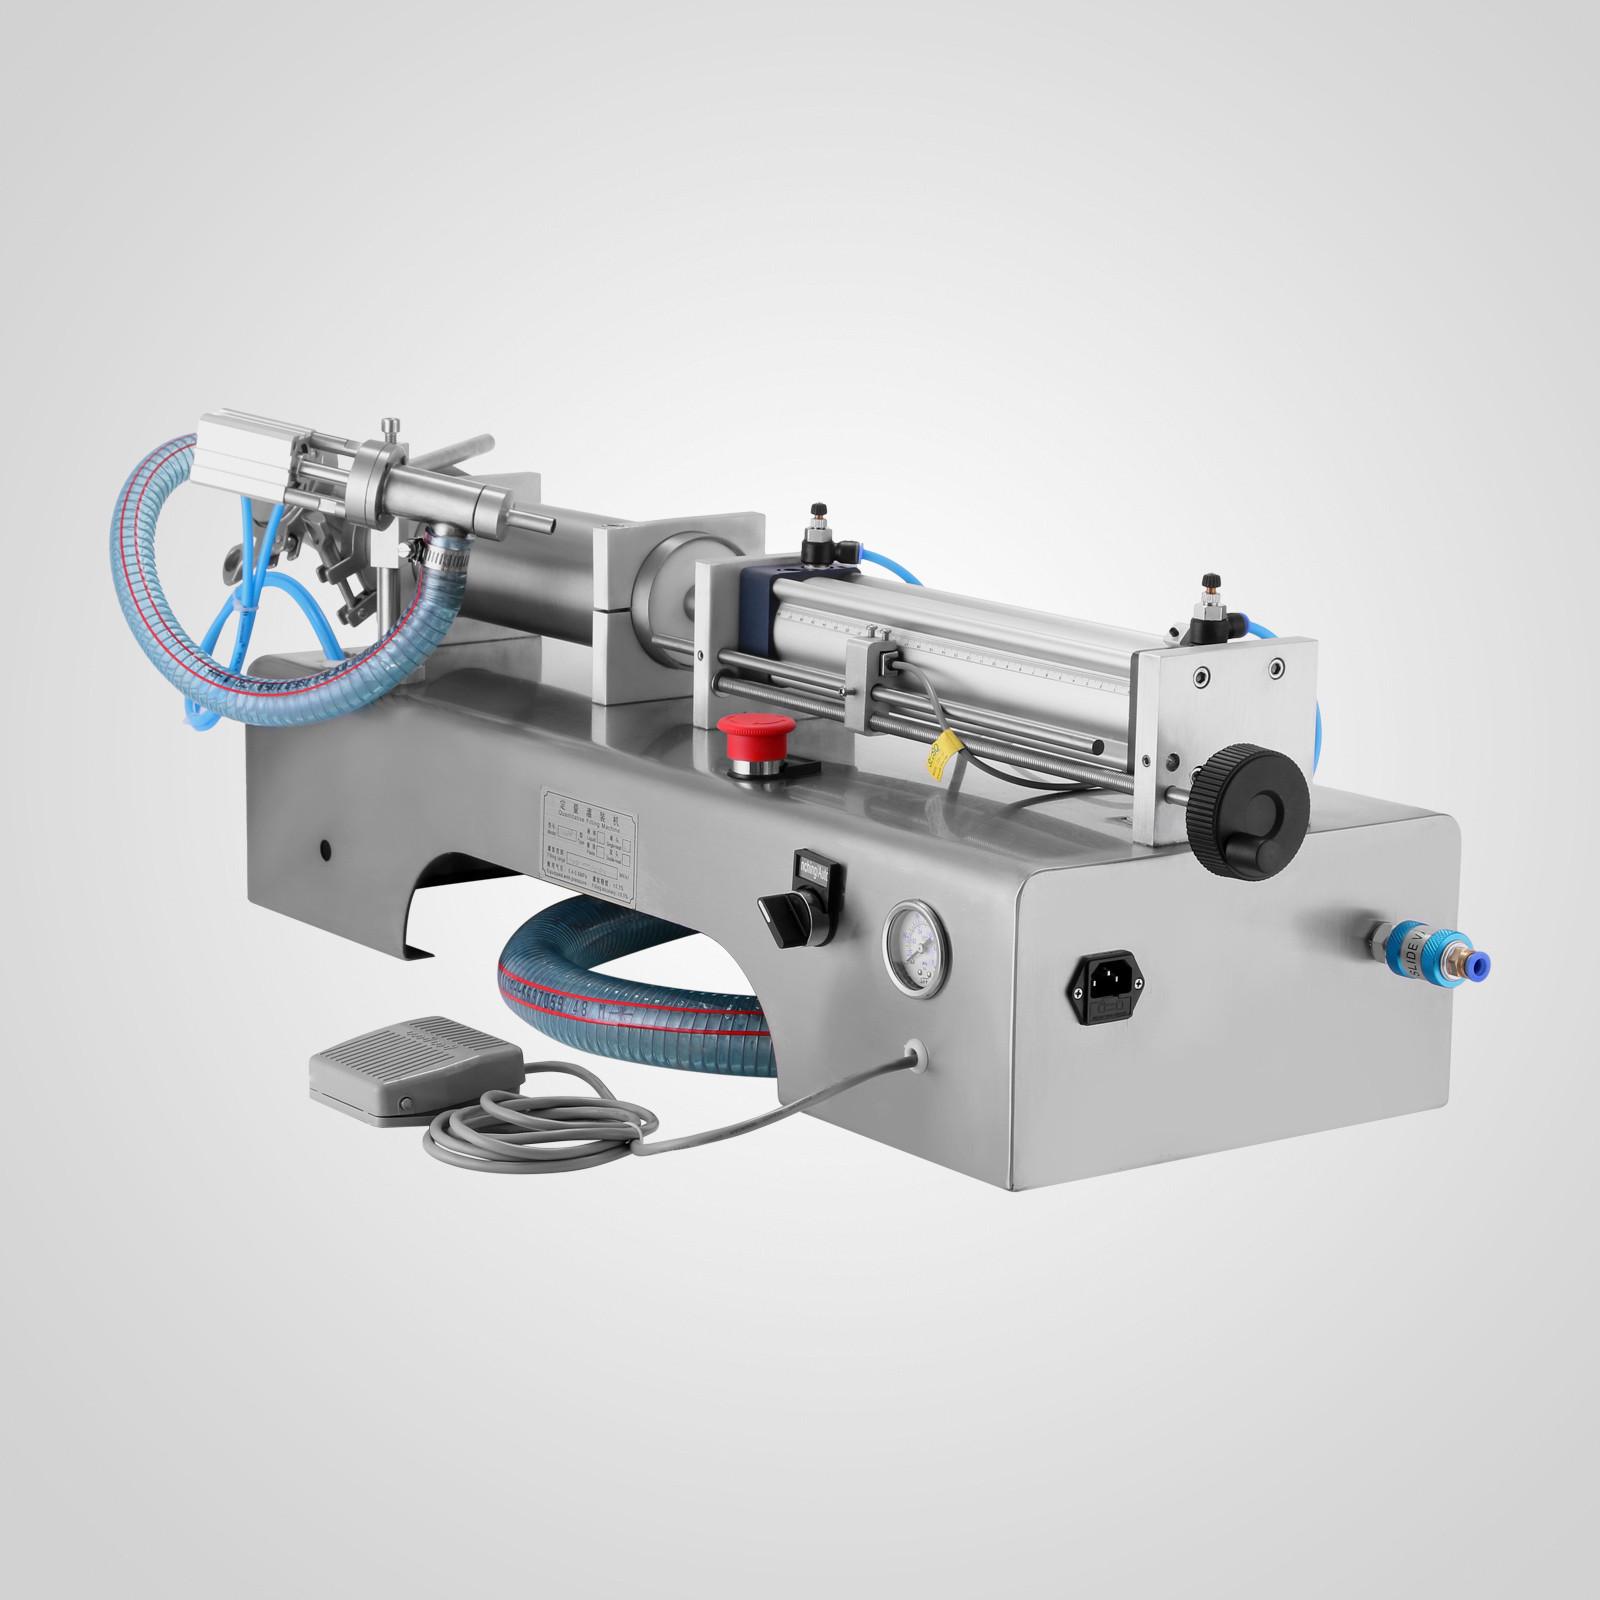 Liquid-Filling-Machine-Filler-Remplissage-2-3500ML-50-500ML-INDUSTRY-SUPPLY miniature 66